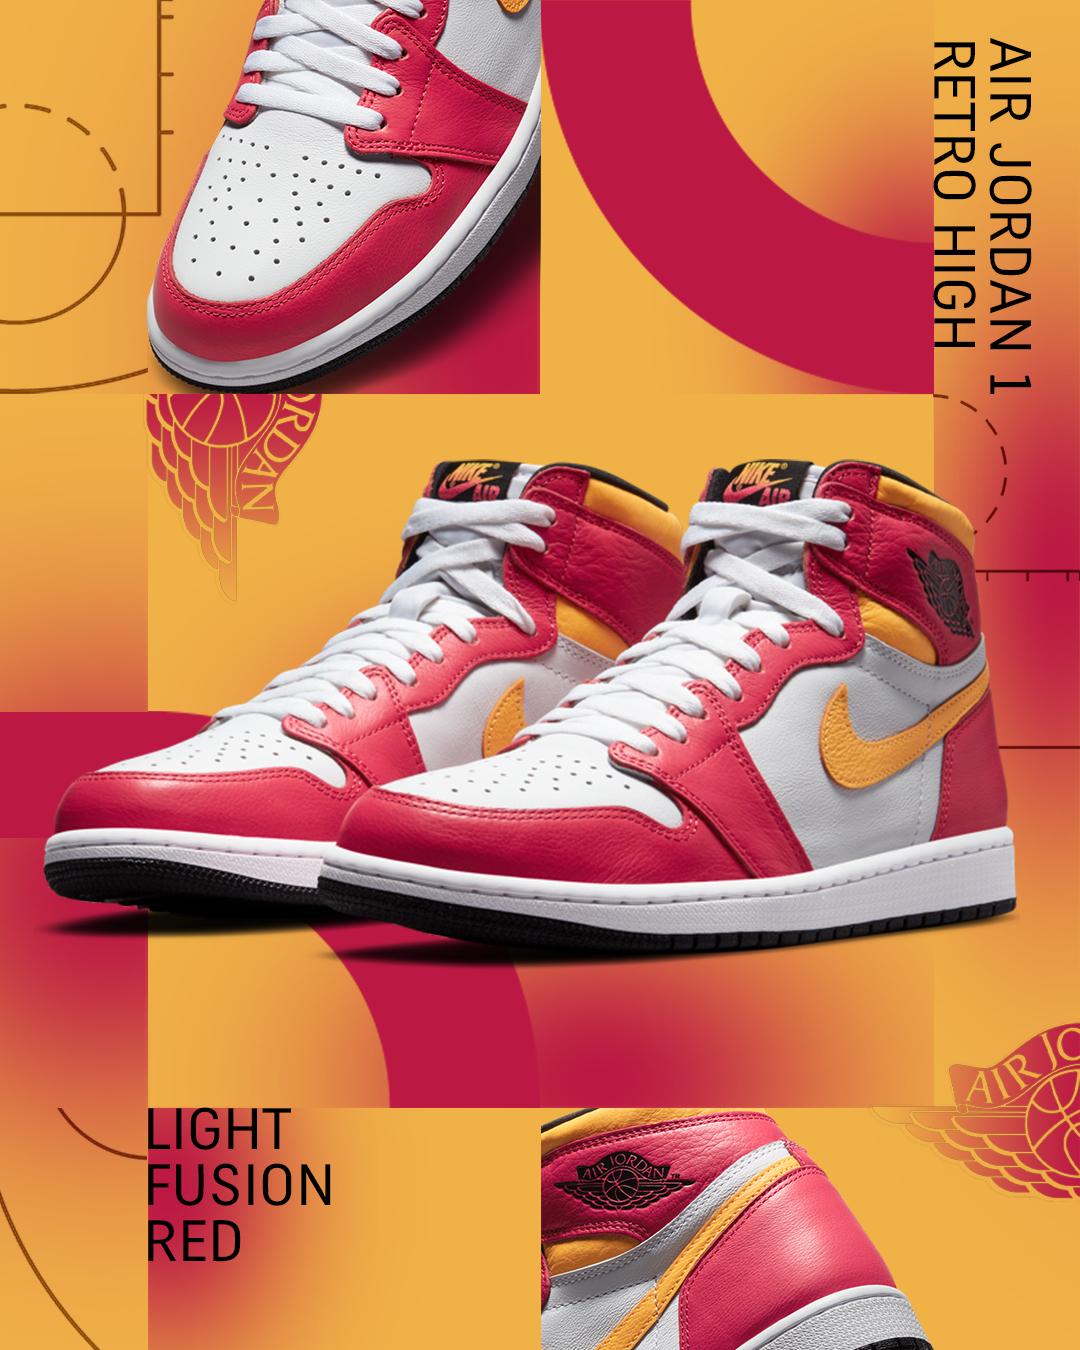 Nike-AJ1-Light-Red-Fusion-Red